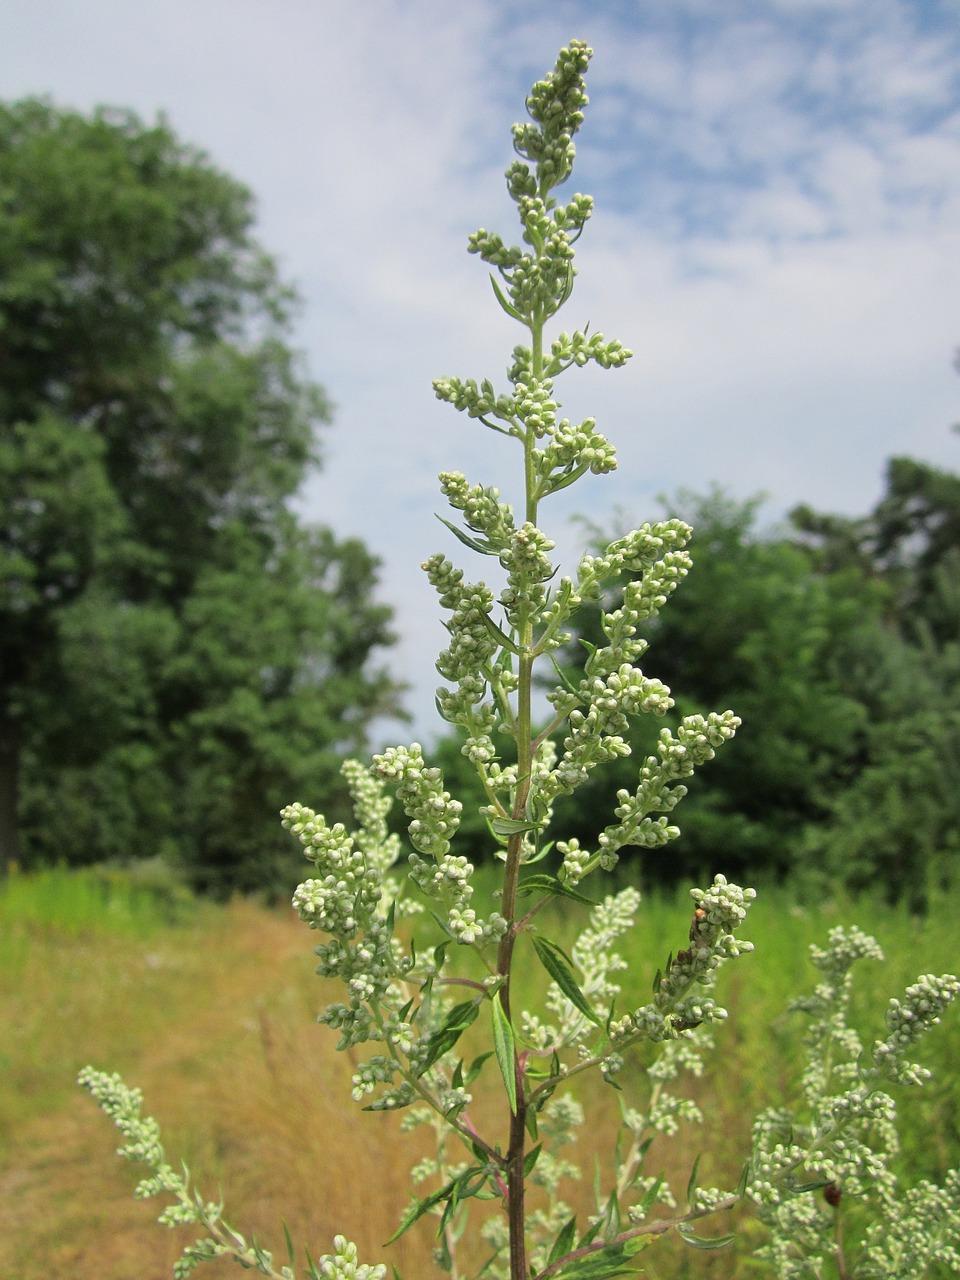 artemisia-vulgaris-848743-1280.jpg